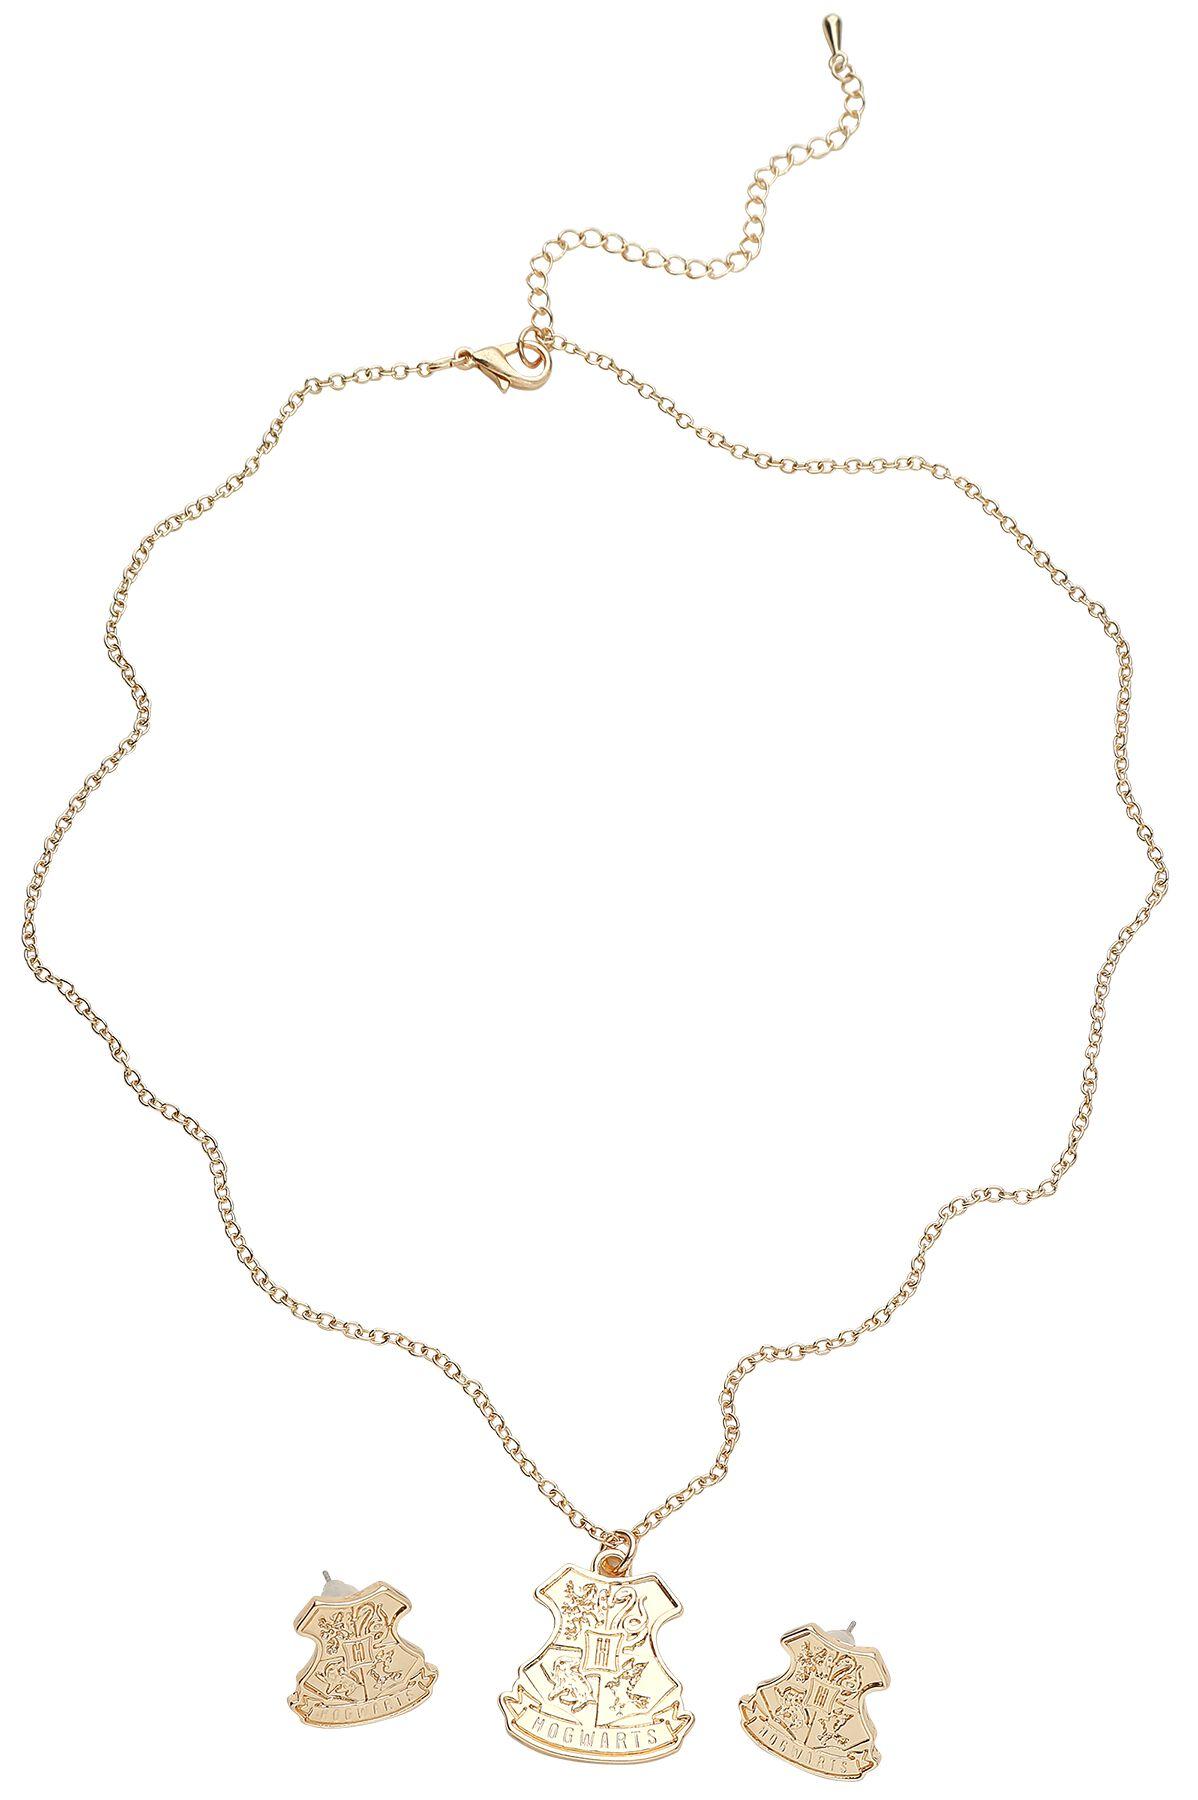 Marki - Biżuteria - komplety - Komplet biżuterii Harry Potter Hogwarts Komplet biżuterii złoty - 368408